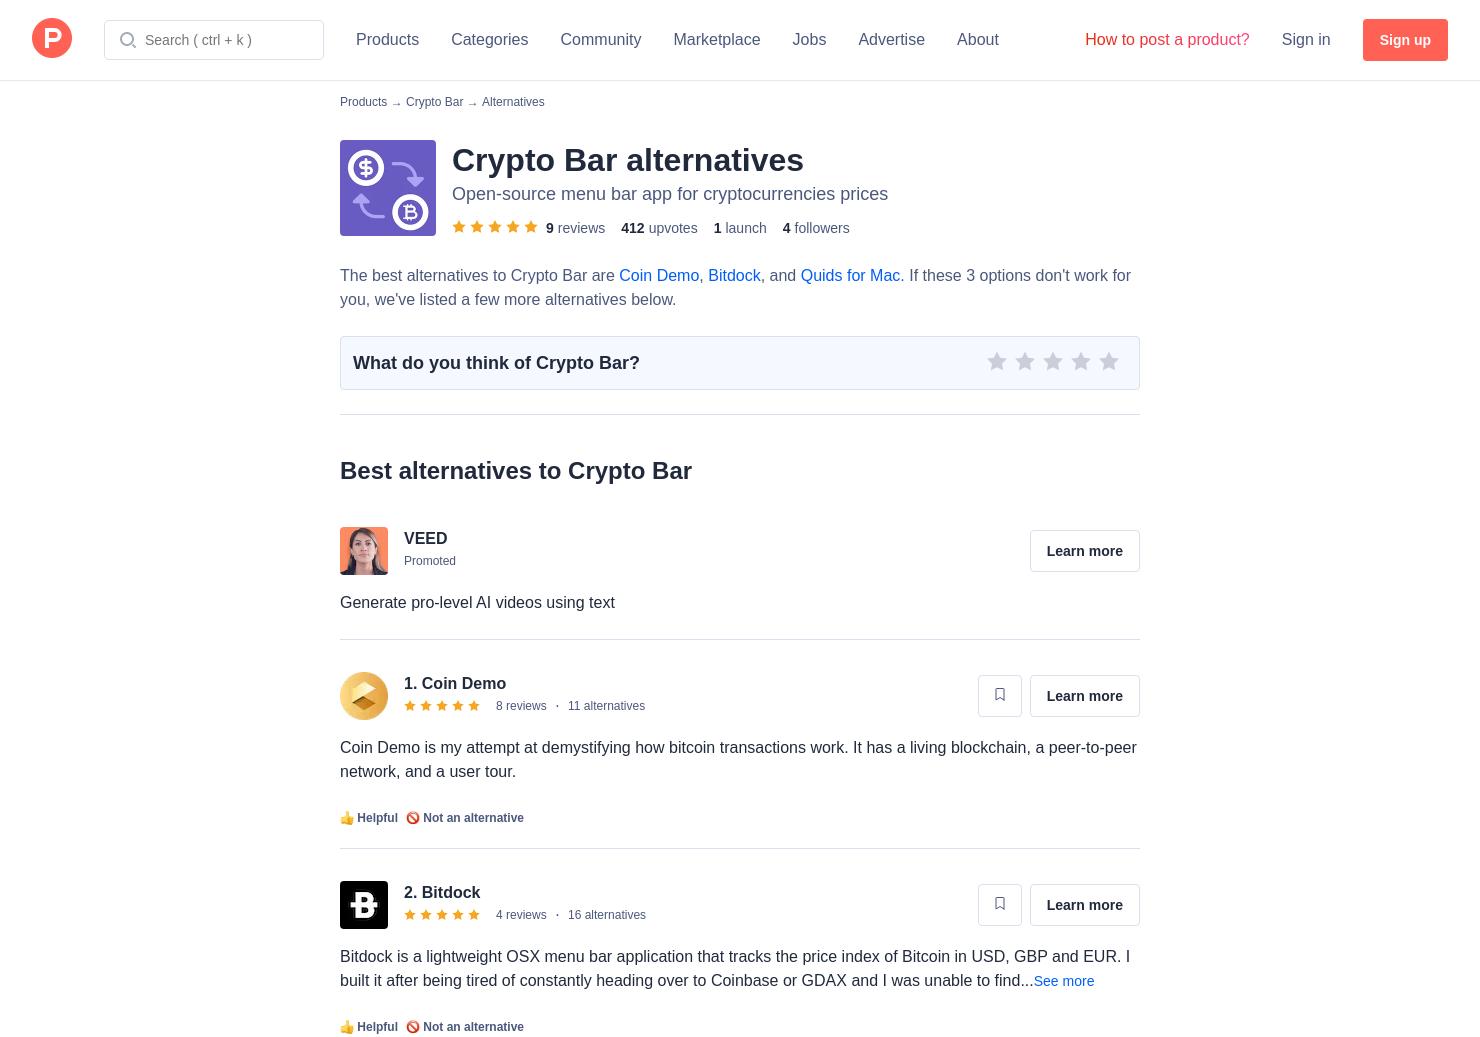 21 Alternatives to Crypto Bar for Mac   Product Hunt